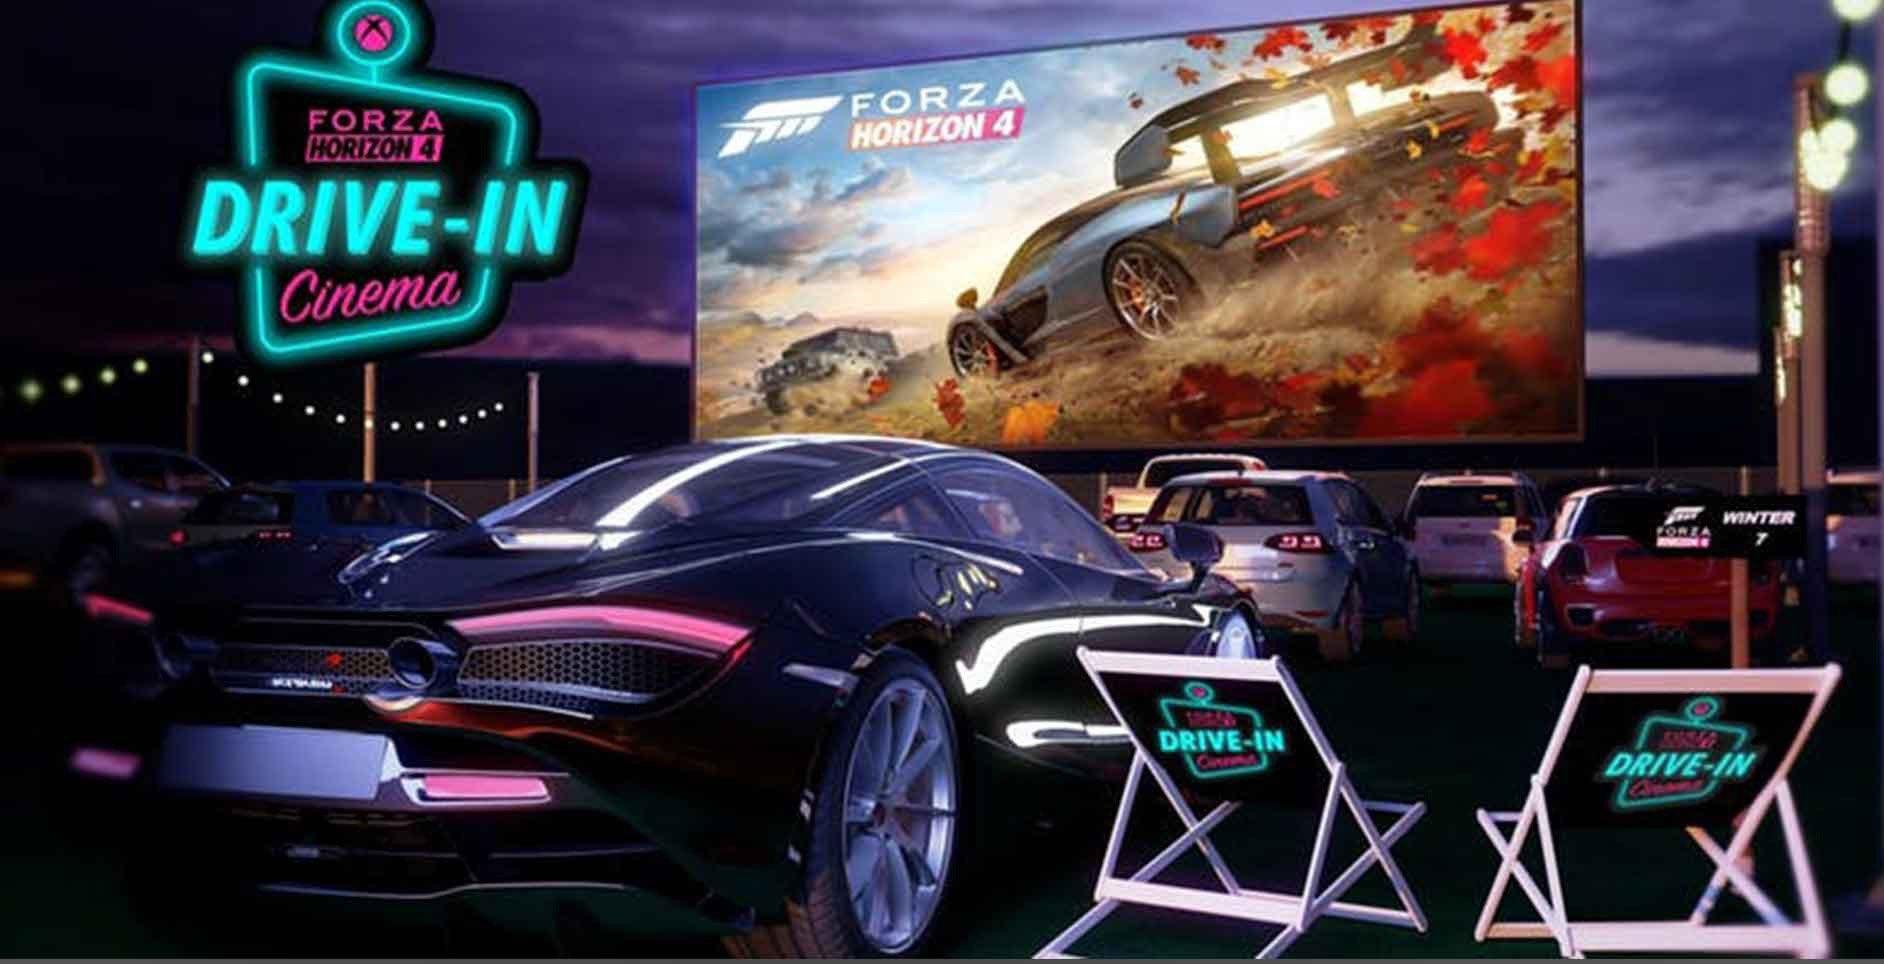 Dirt Car Racing Wallpaper Microsoft Australia Hosting Forza Horizon 4 Drive In Event